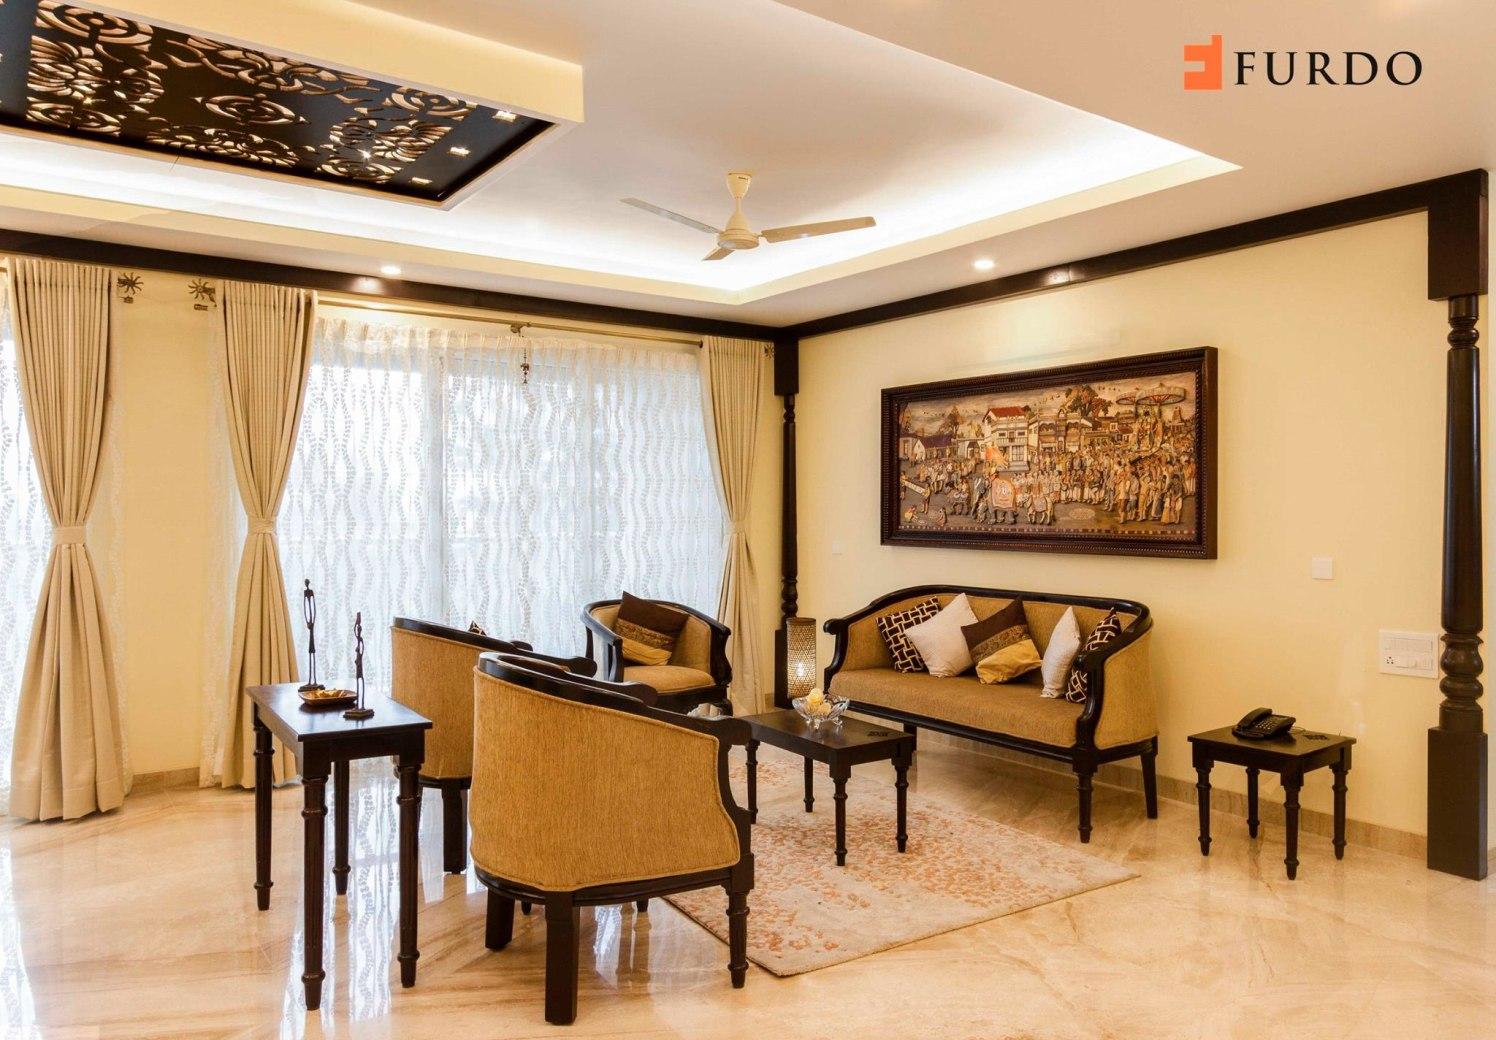 Living Room With Marble Flooring And Artistic False Ceiling by Furdo.com Living-room Vintage | Interior Design Photos & Ideas